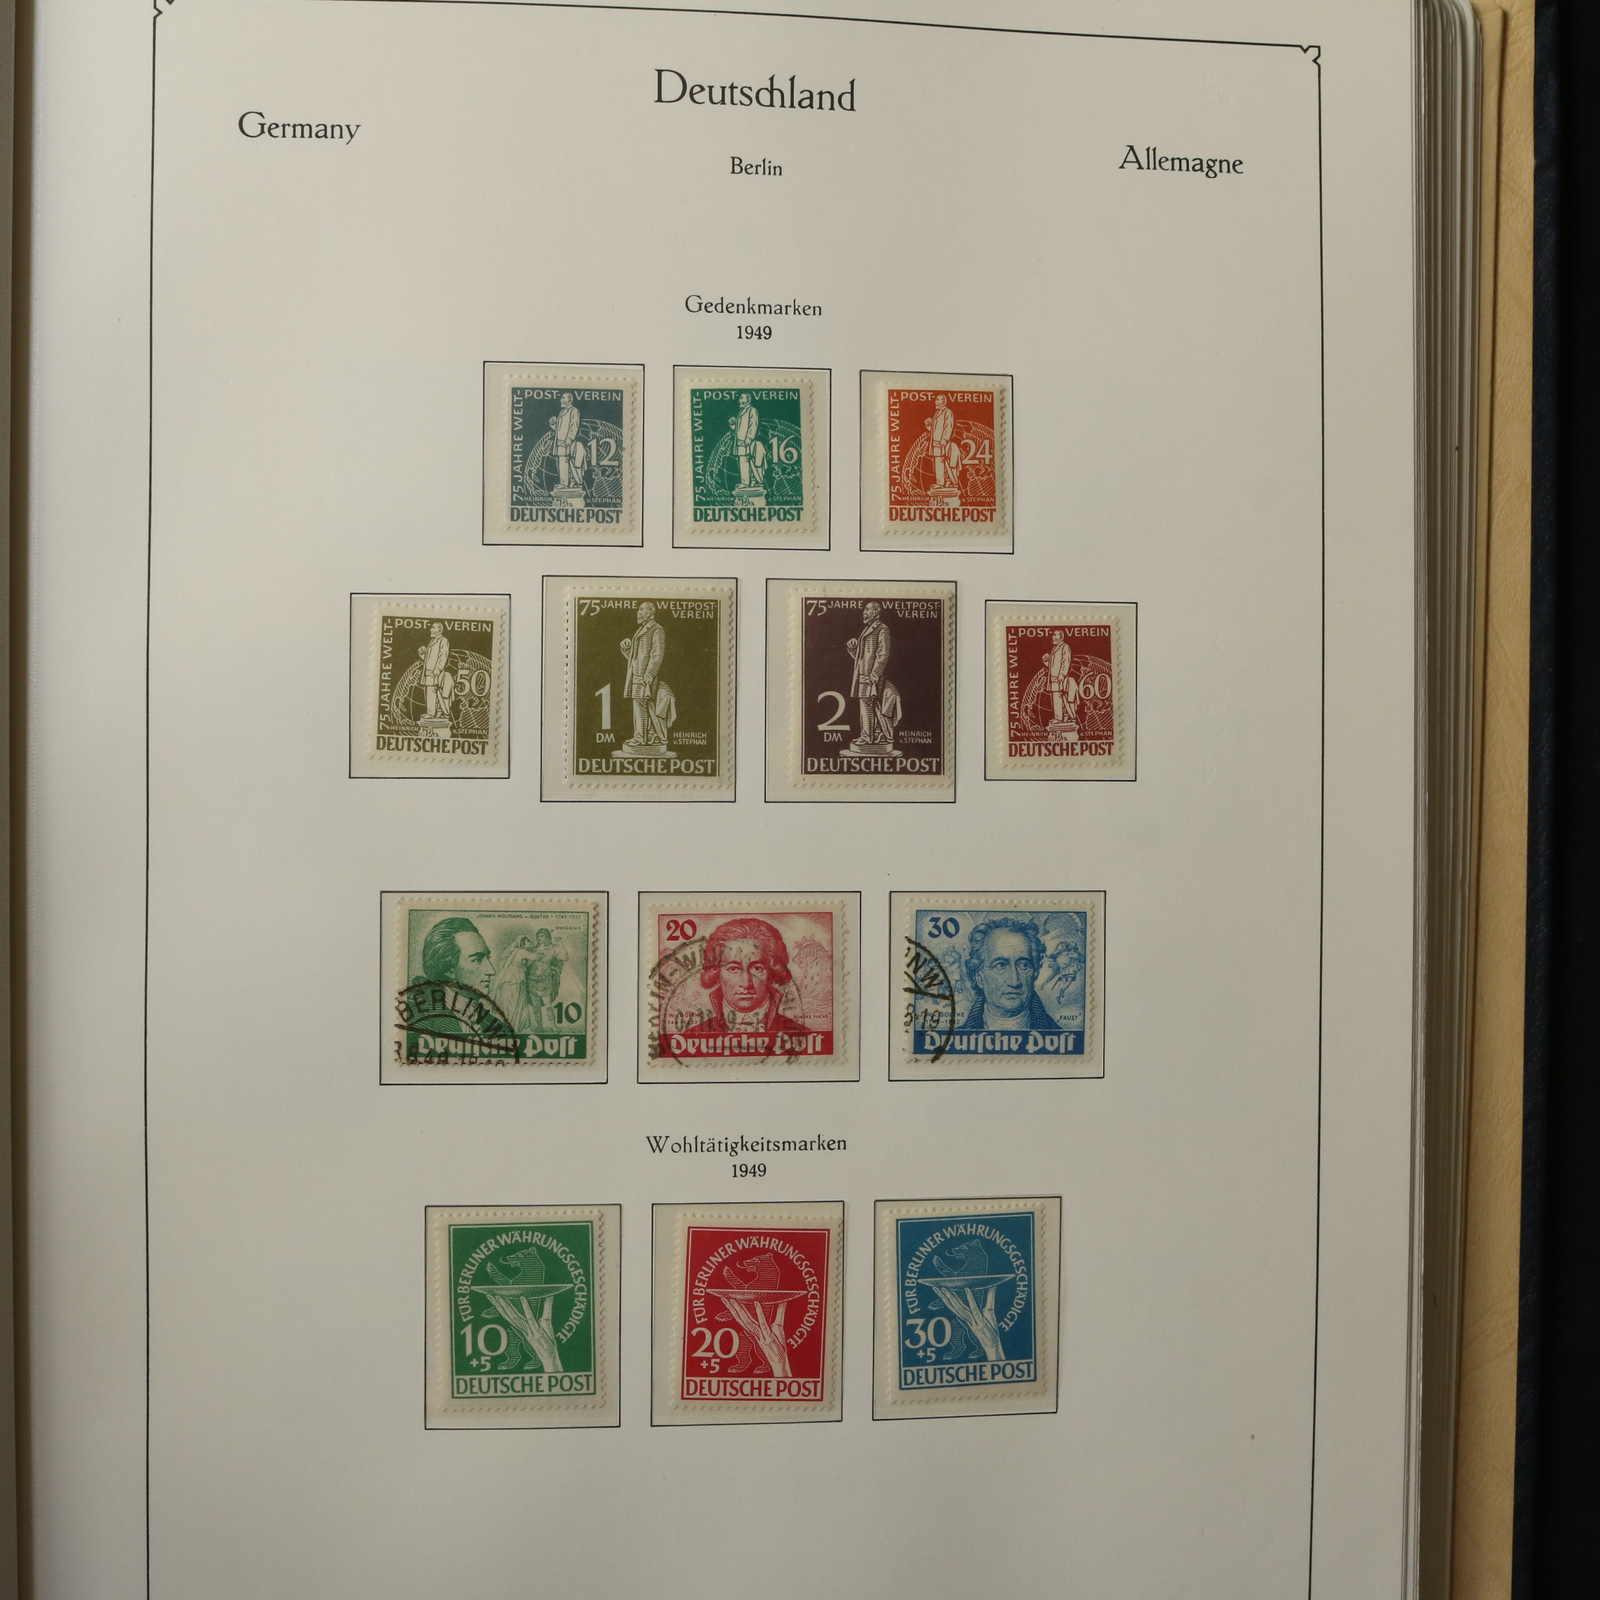 60 Geprüft Schlegel Freimarken Tegeler Schloss Berlin 1948-1949 Nett Berlin 1949 Postfrisch Minr Briefmarken